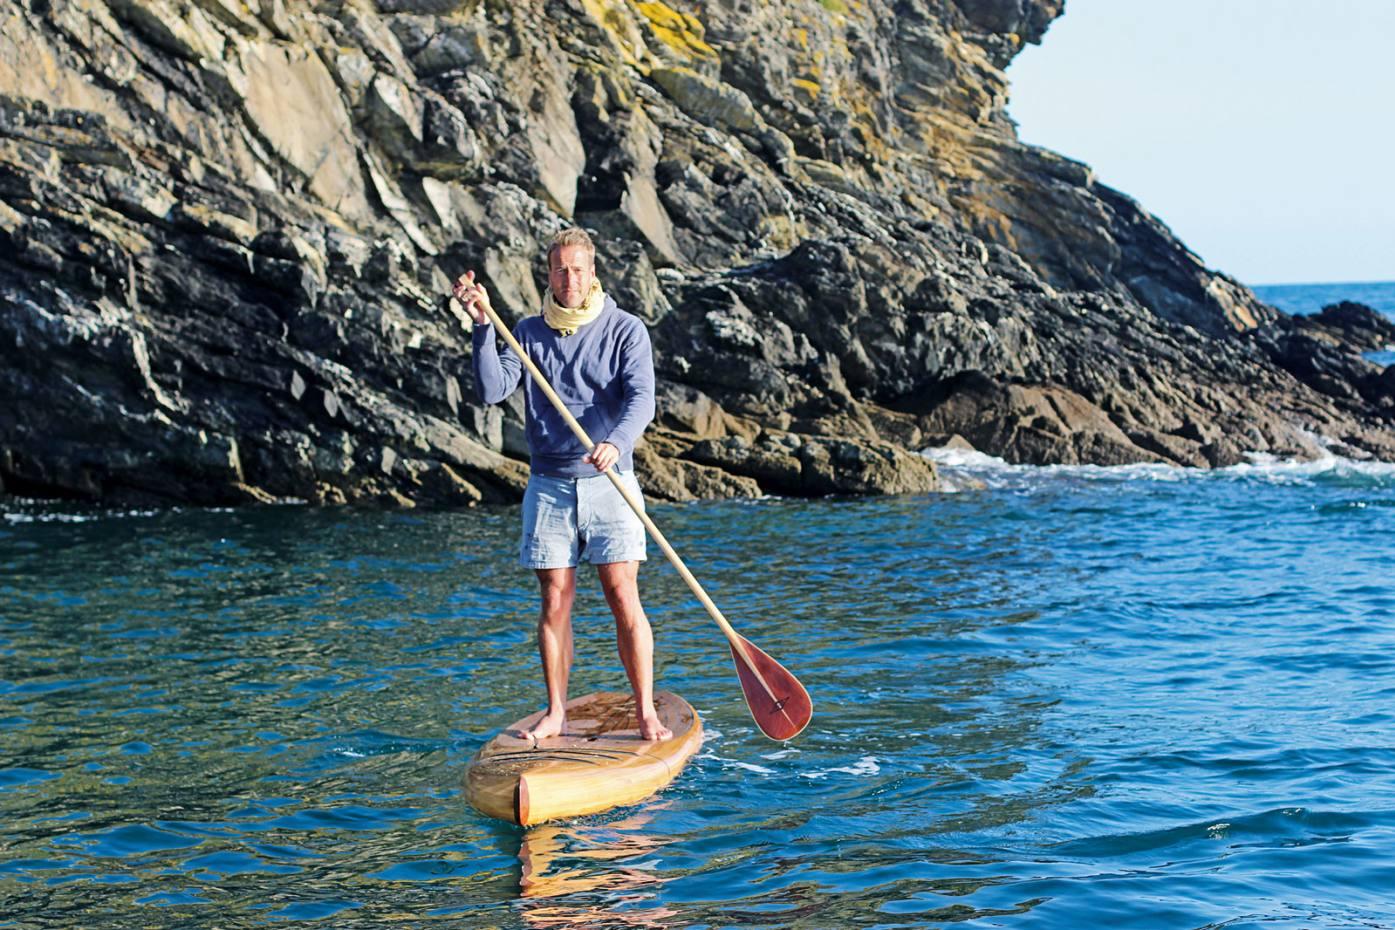 Ben Fogle on hishandmade paddleboard, ClipperMk I